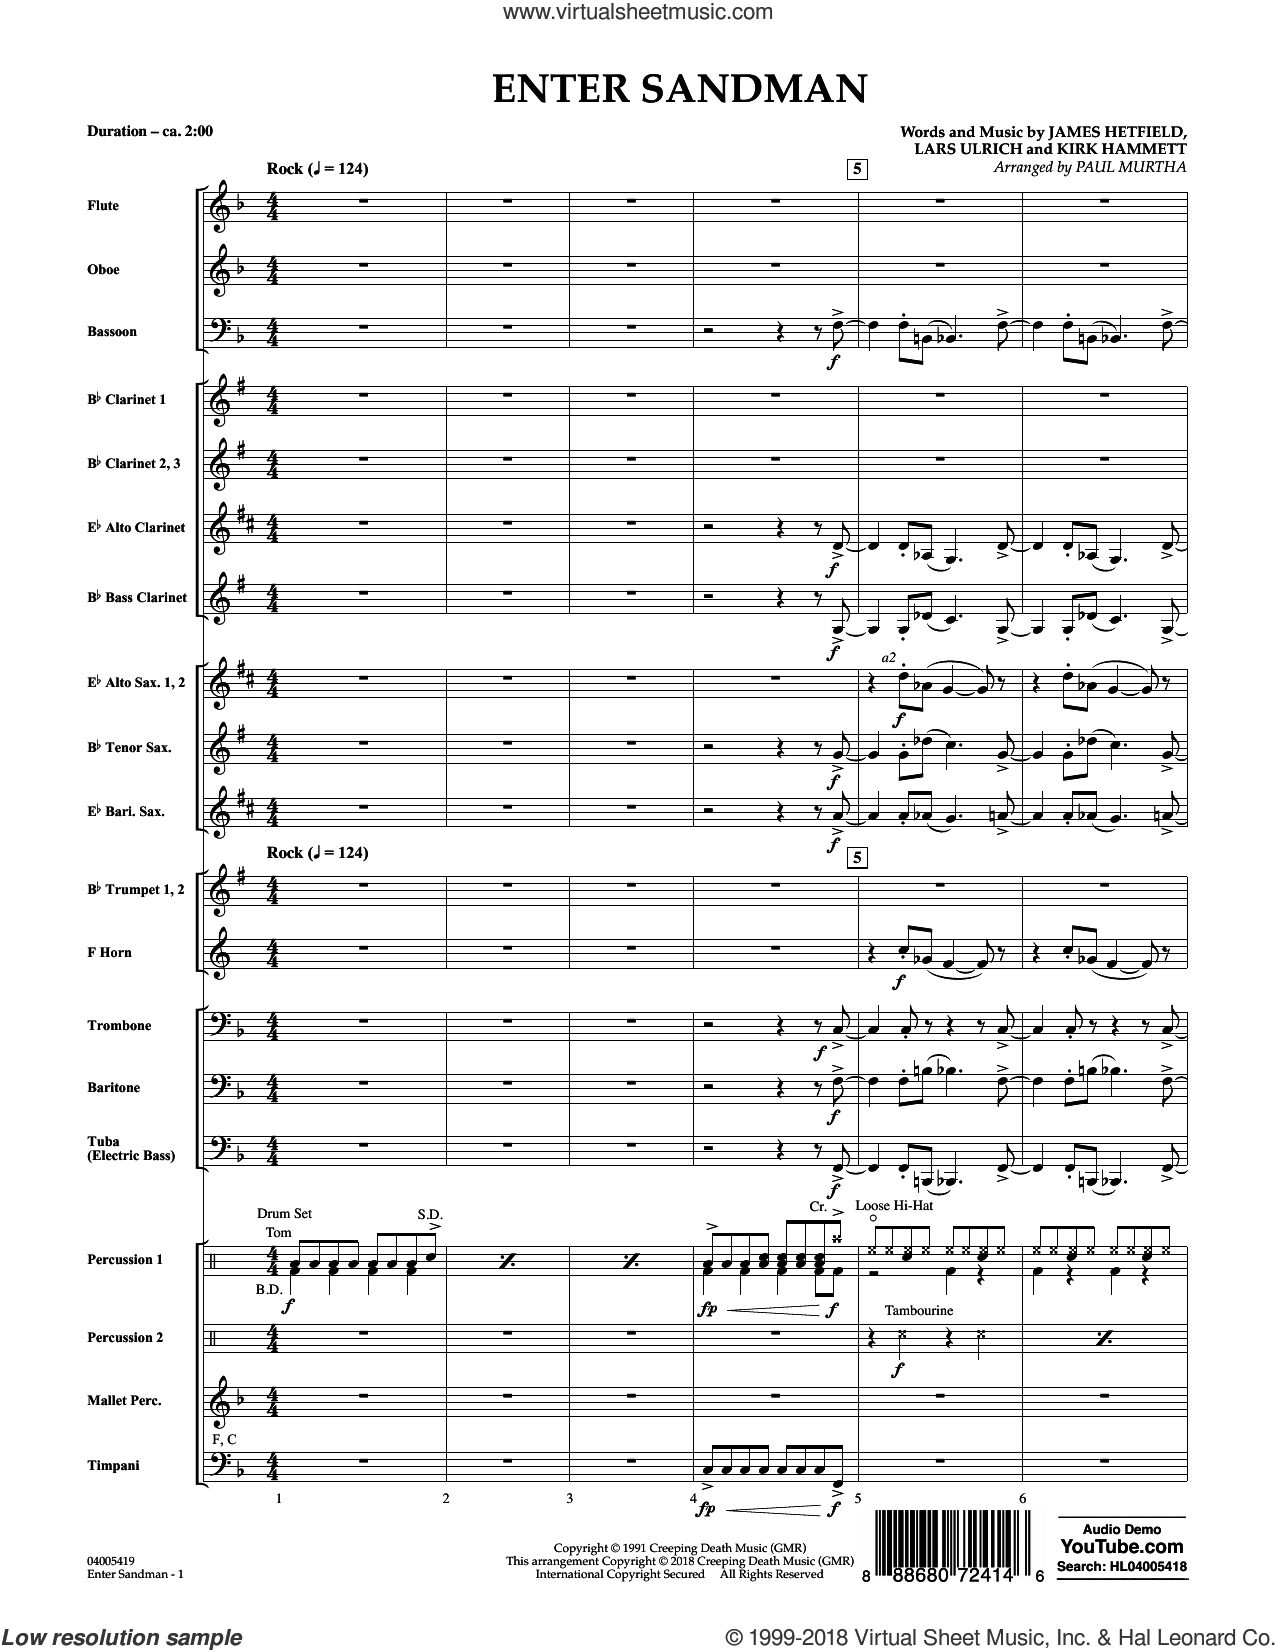 Enter Sandman (COMPLETE) sheet music for concert band by Paul Murtha, James Hetfield, Kirk Hammett, Lars Ulrich and Metallica, intermediate skill level